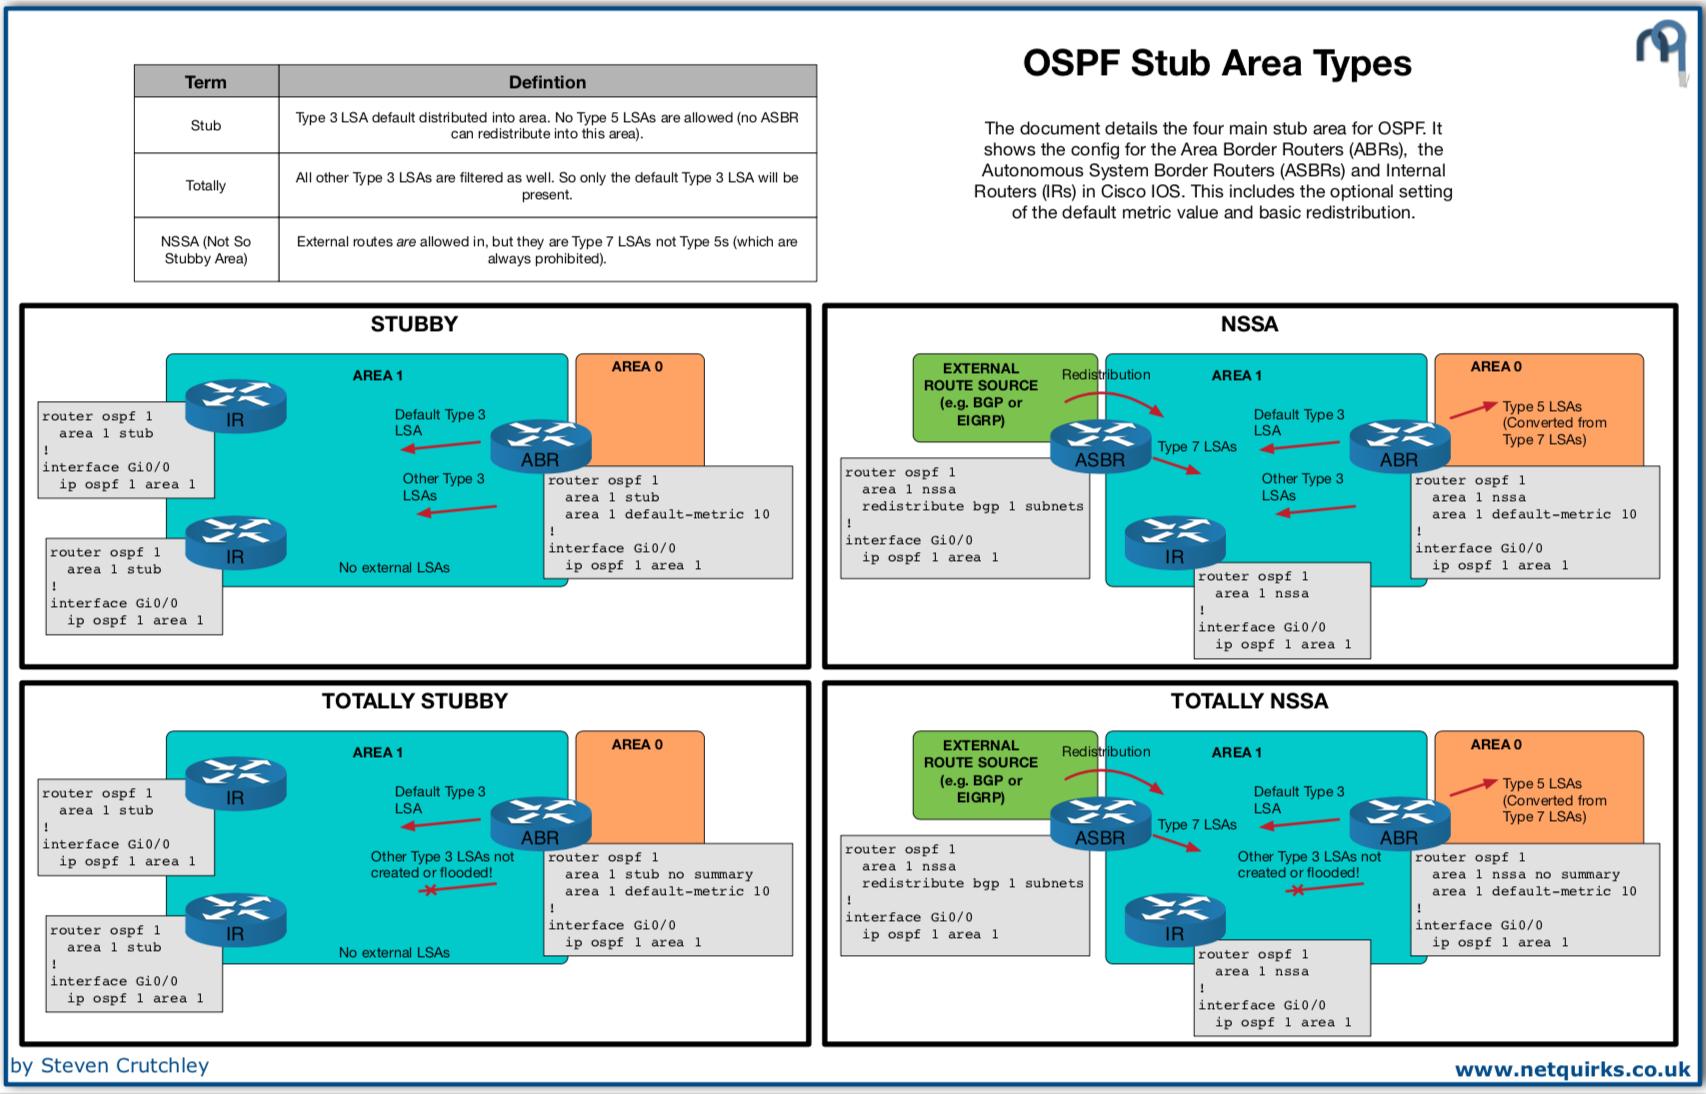 OSPF_Stub_Area_types_thumbnail